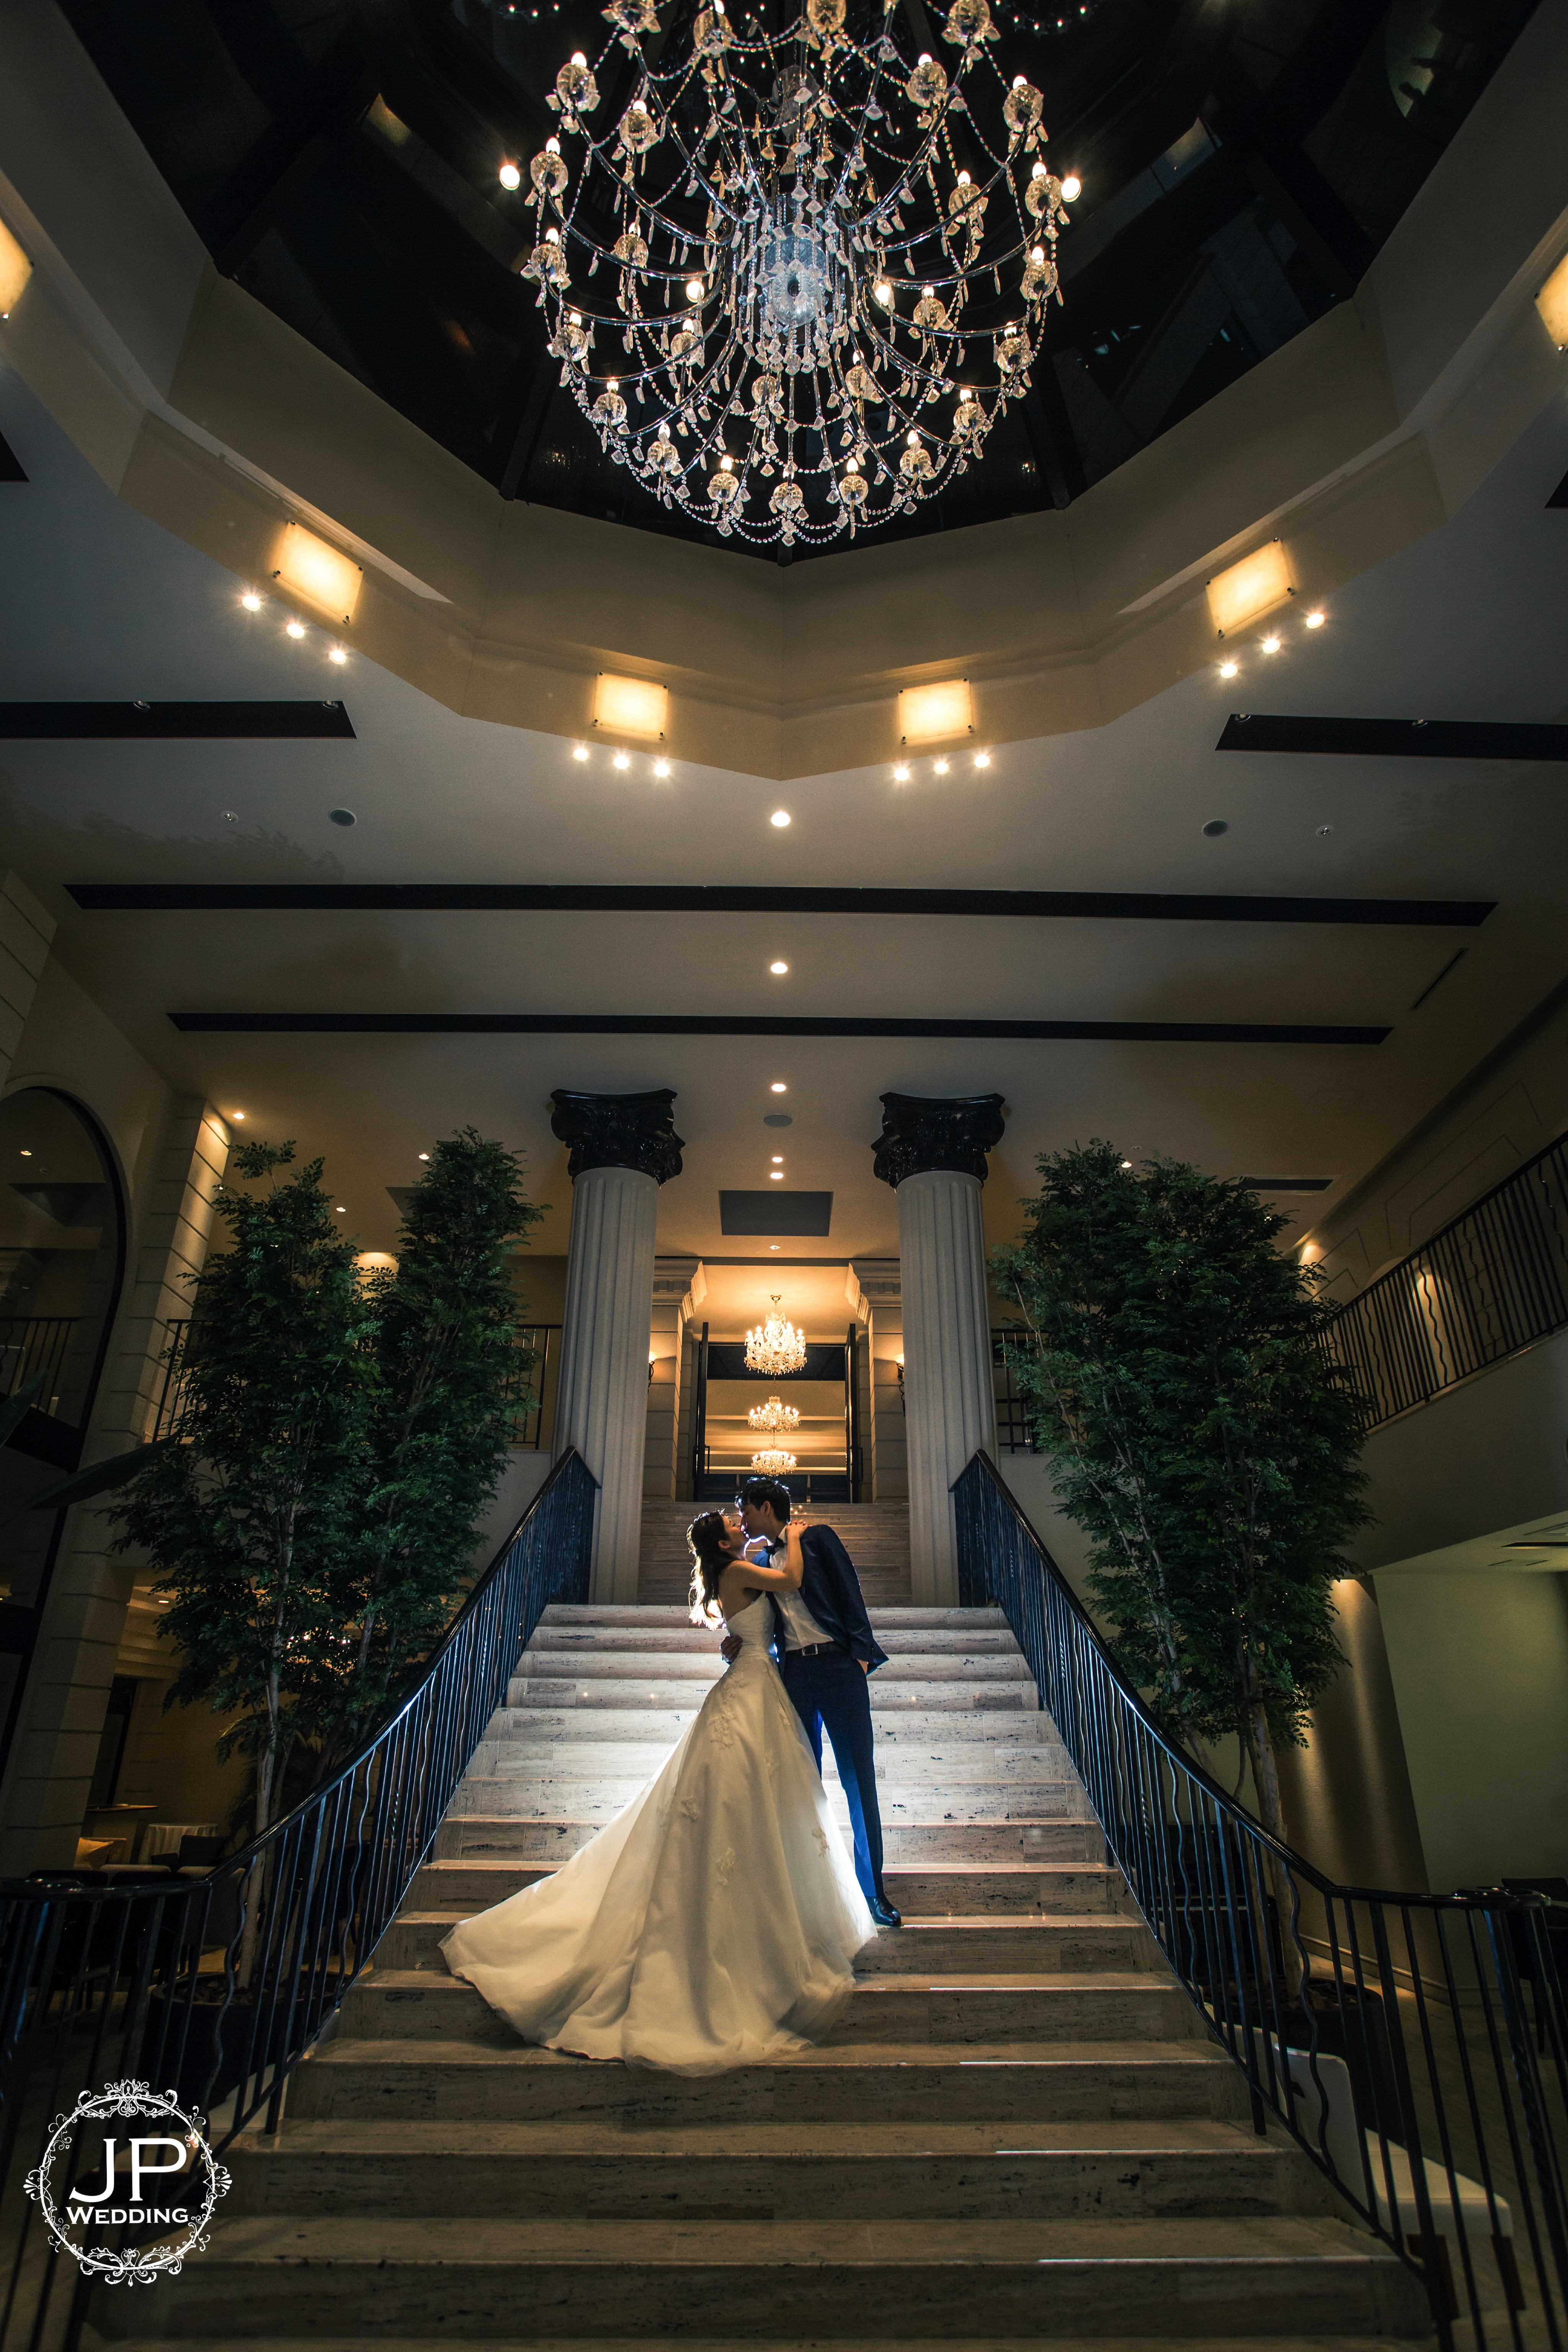 JP Wedding香港日本婚紗攝影-5